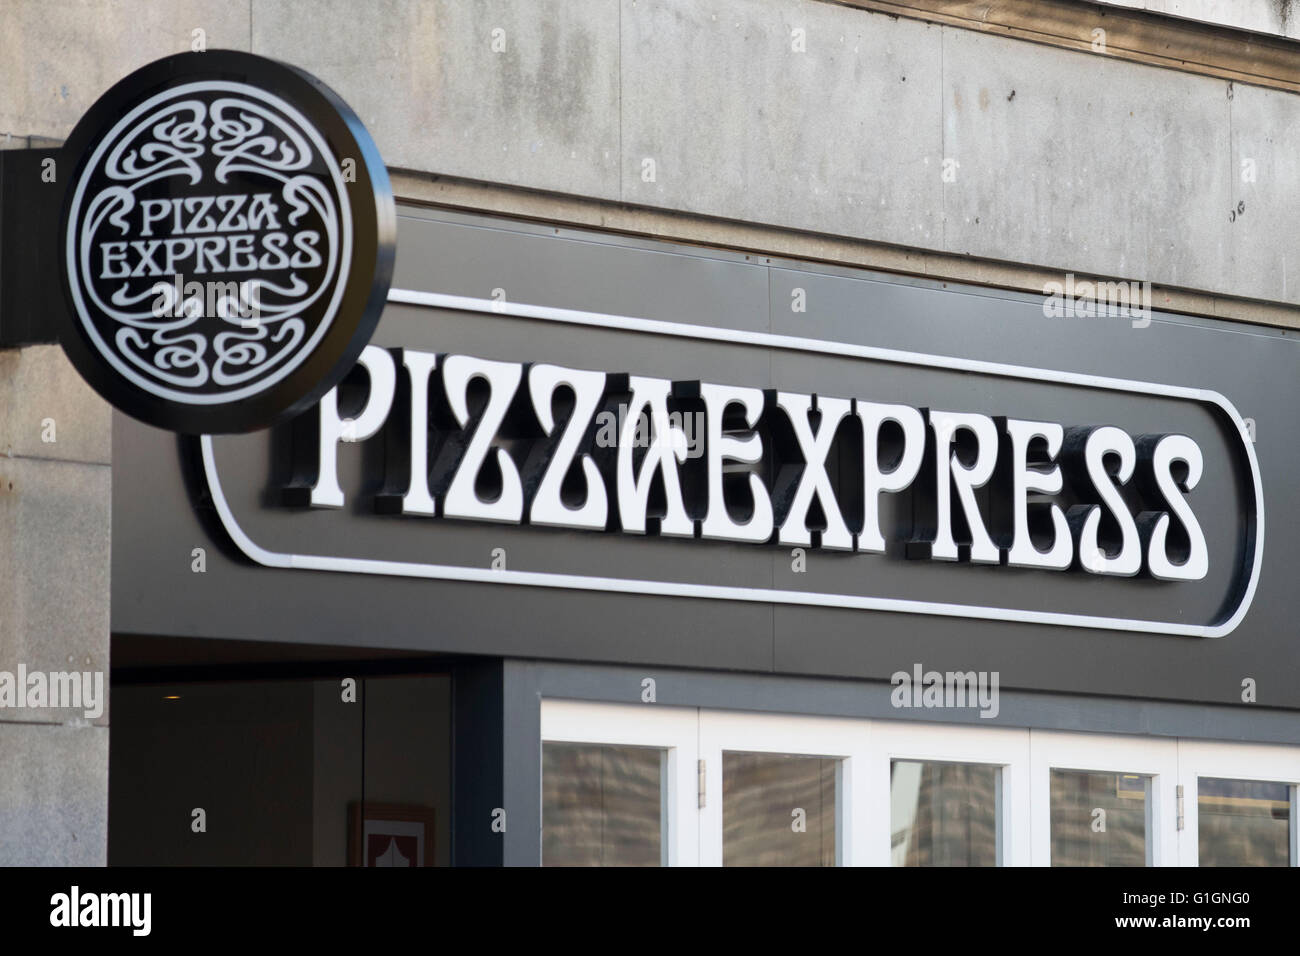 Pizza Express Branding Stock Photos Pizza Express Branding